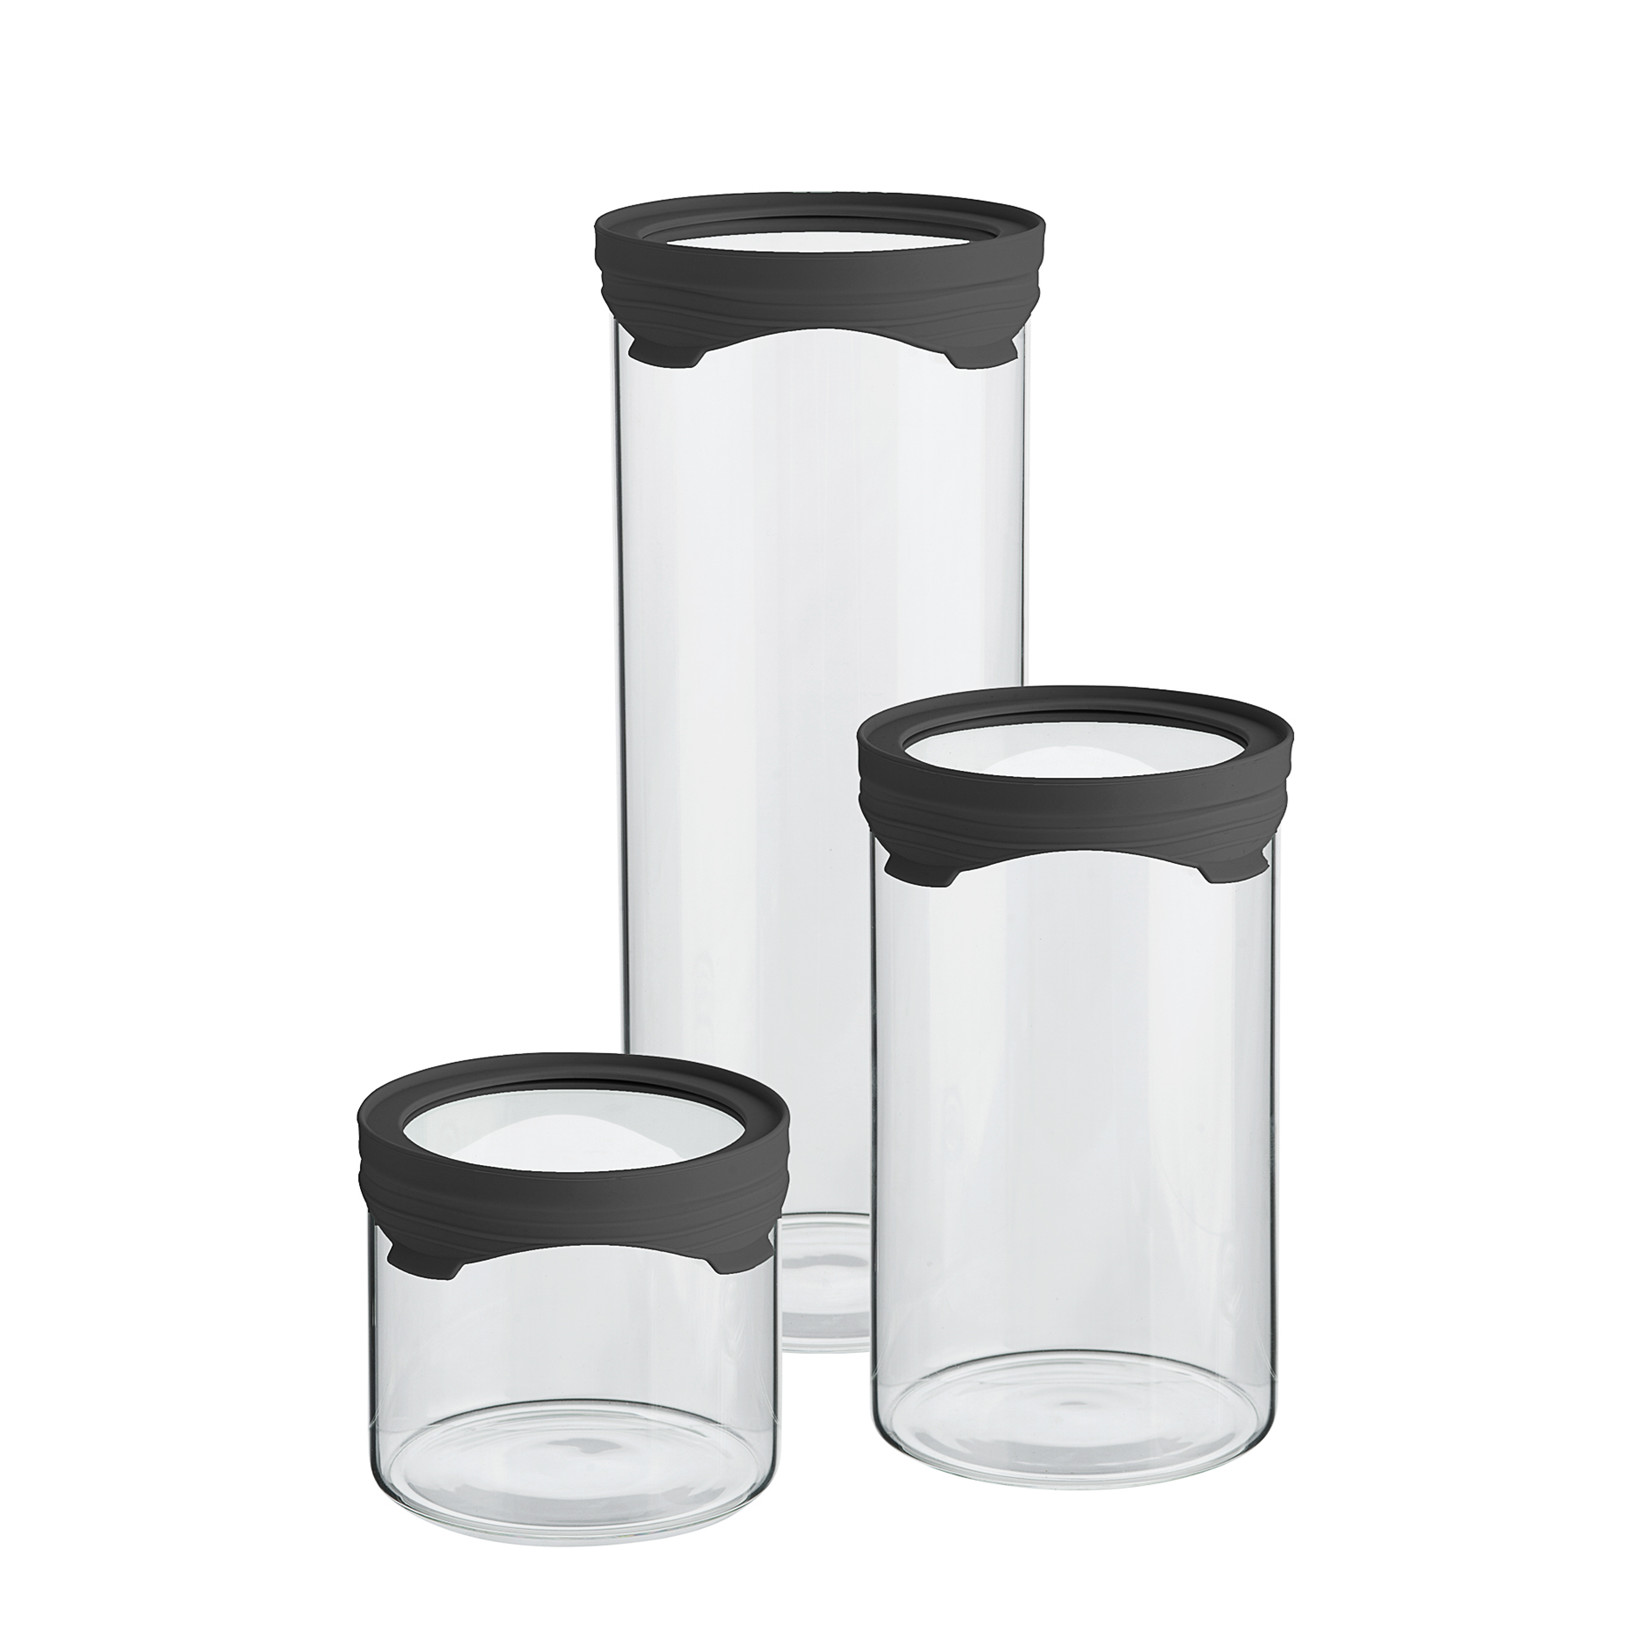 Krukker Glas Kob Krukker Glas Online Her